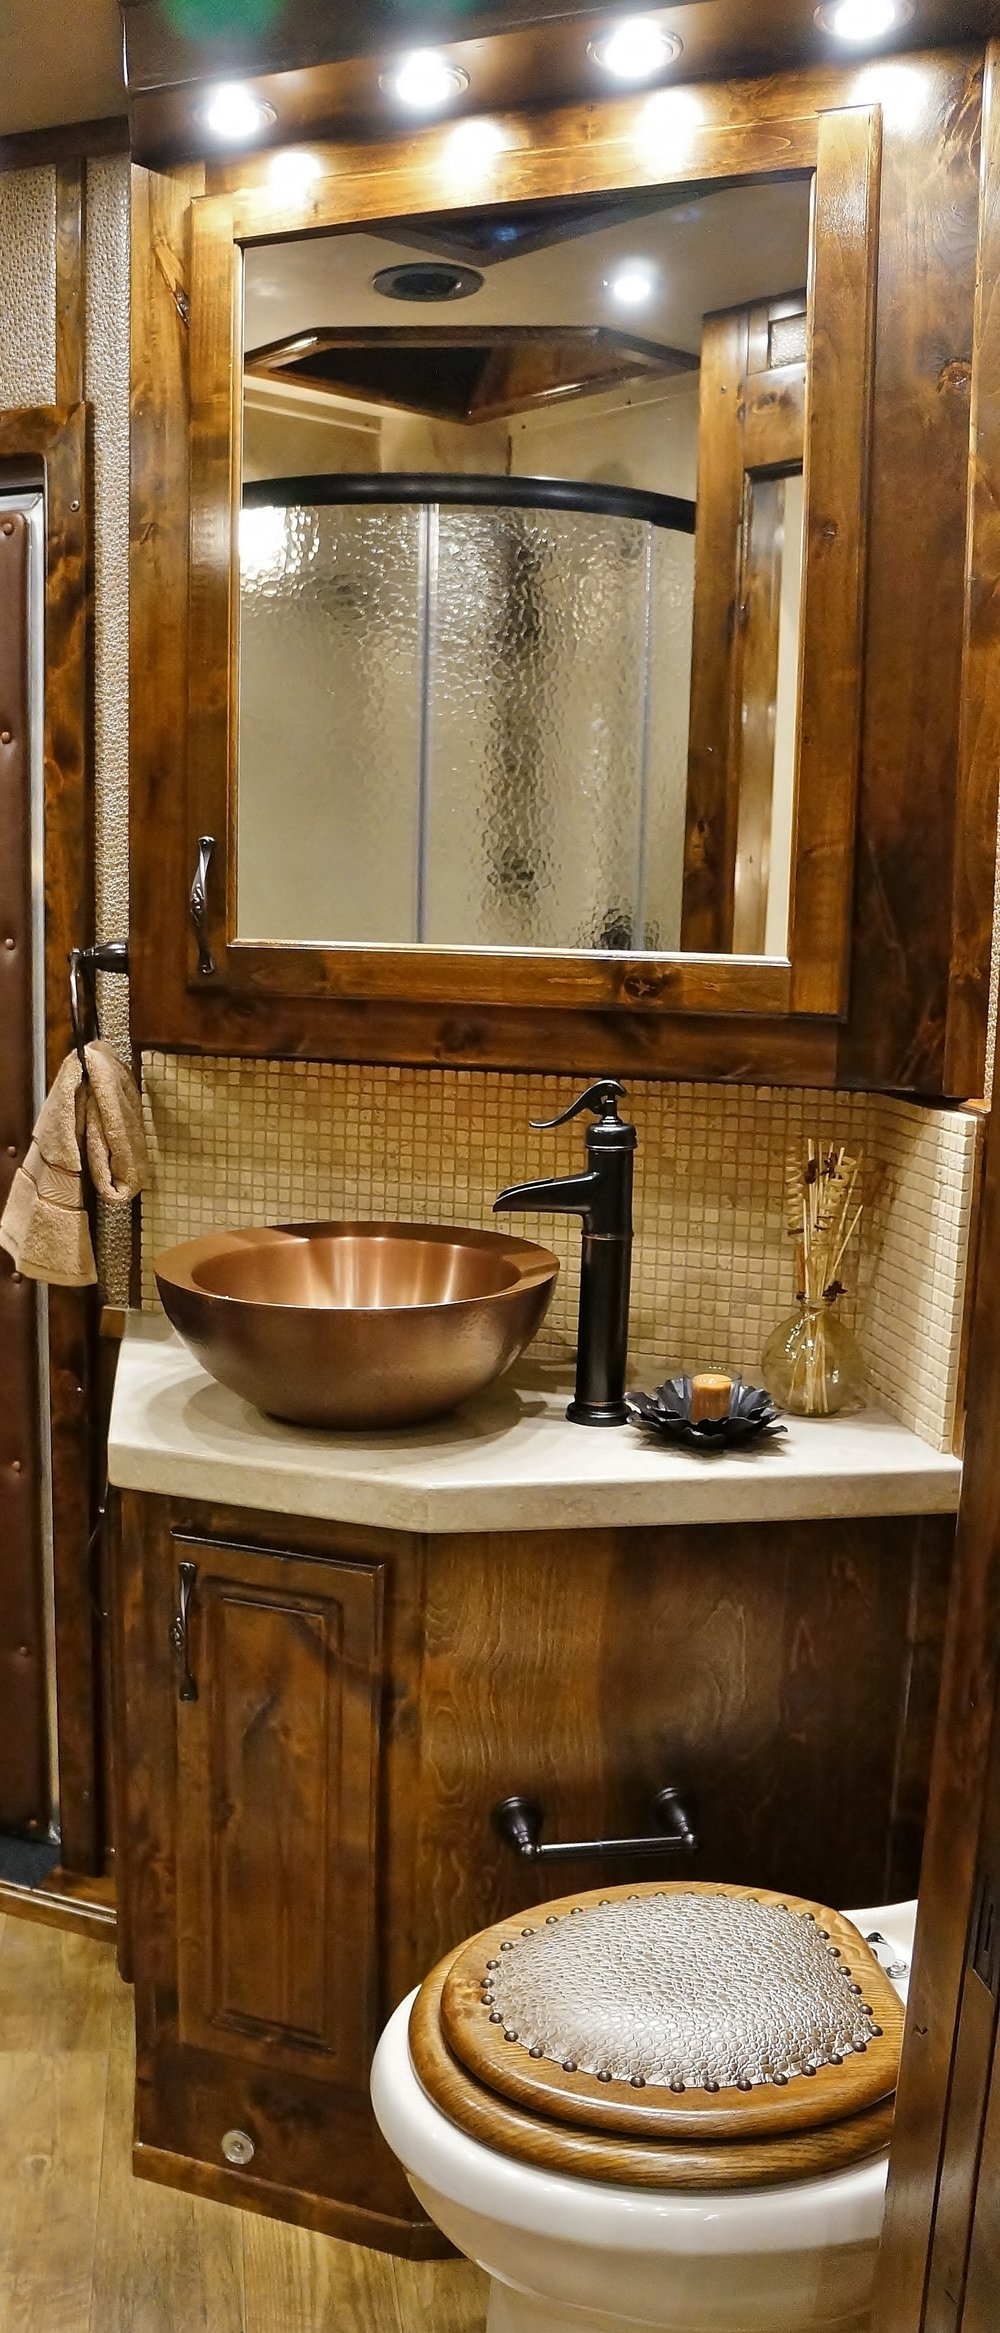 Copper Vessel Sink with Bronze Faucet